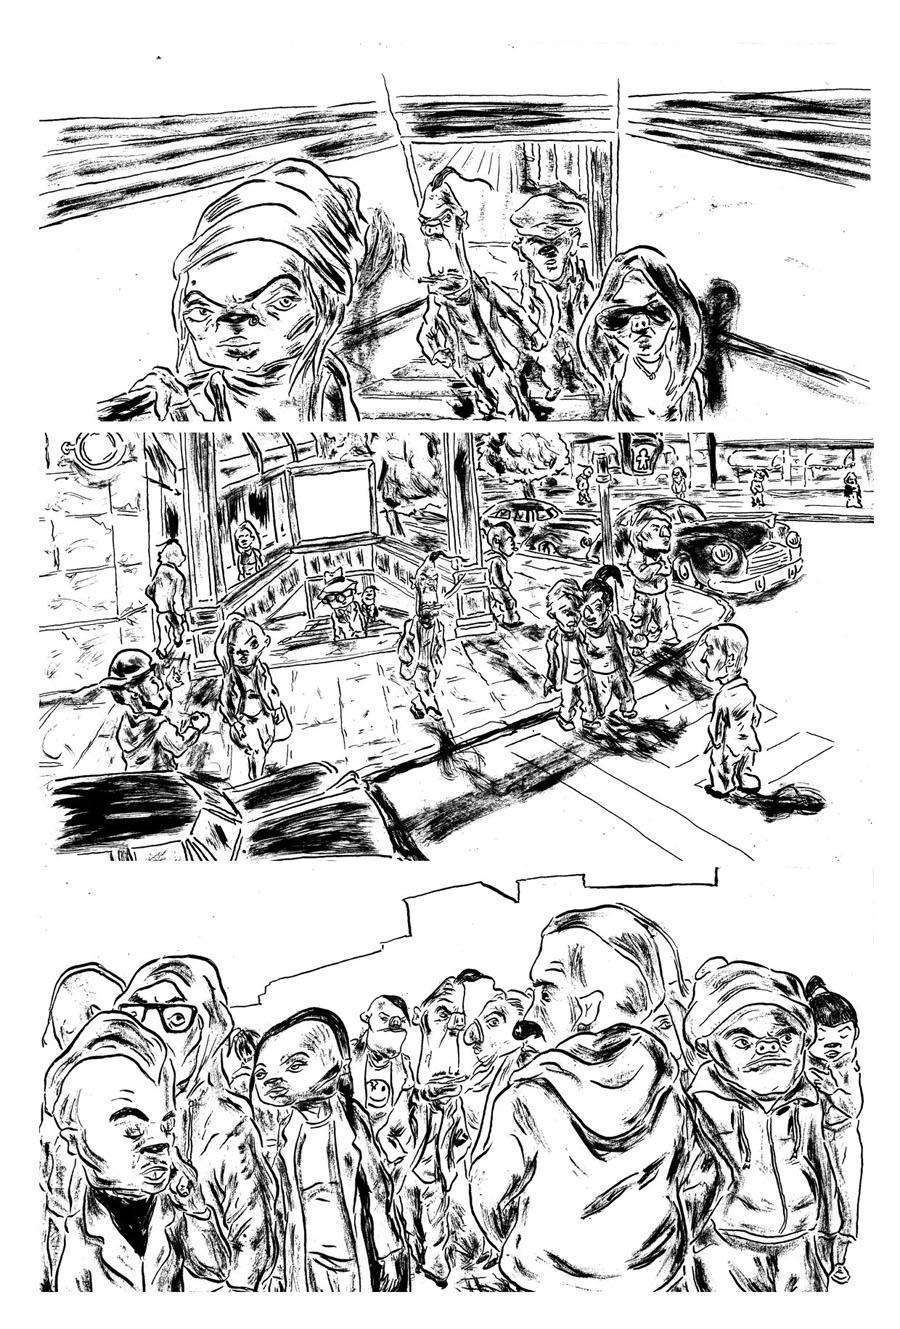 diego-rey-pagina-tinta